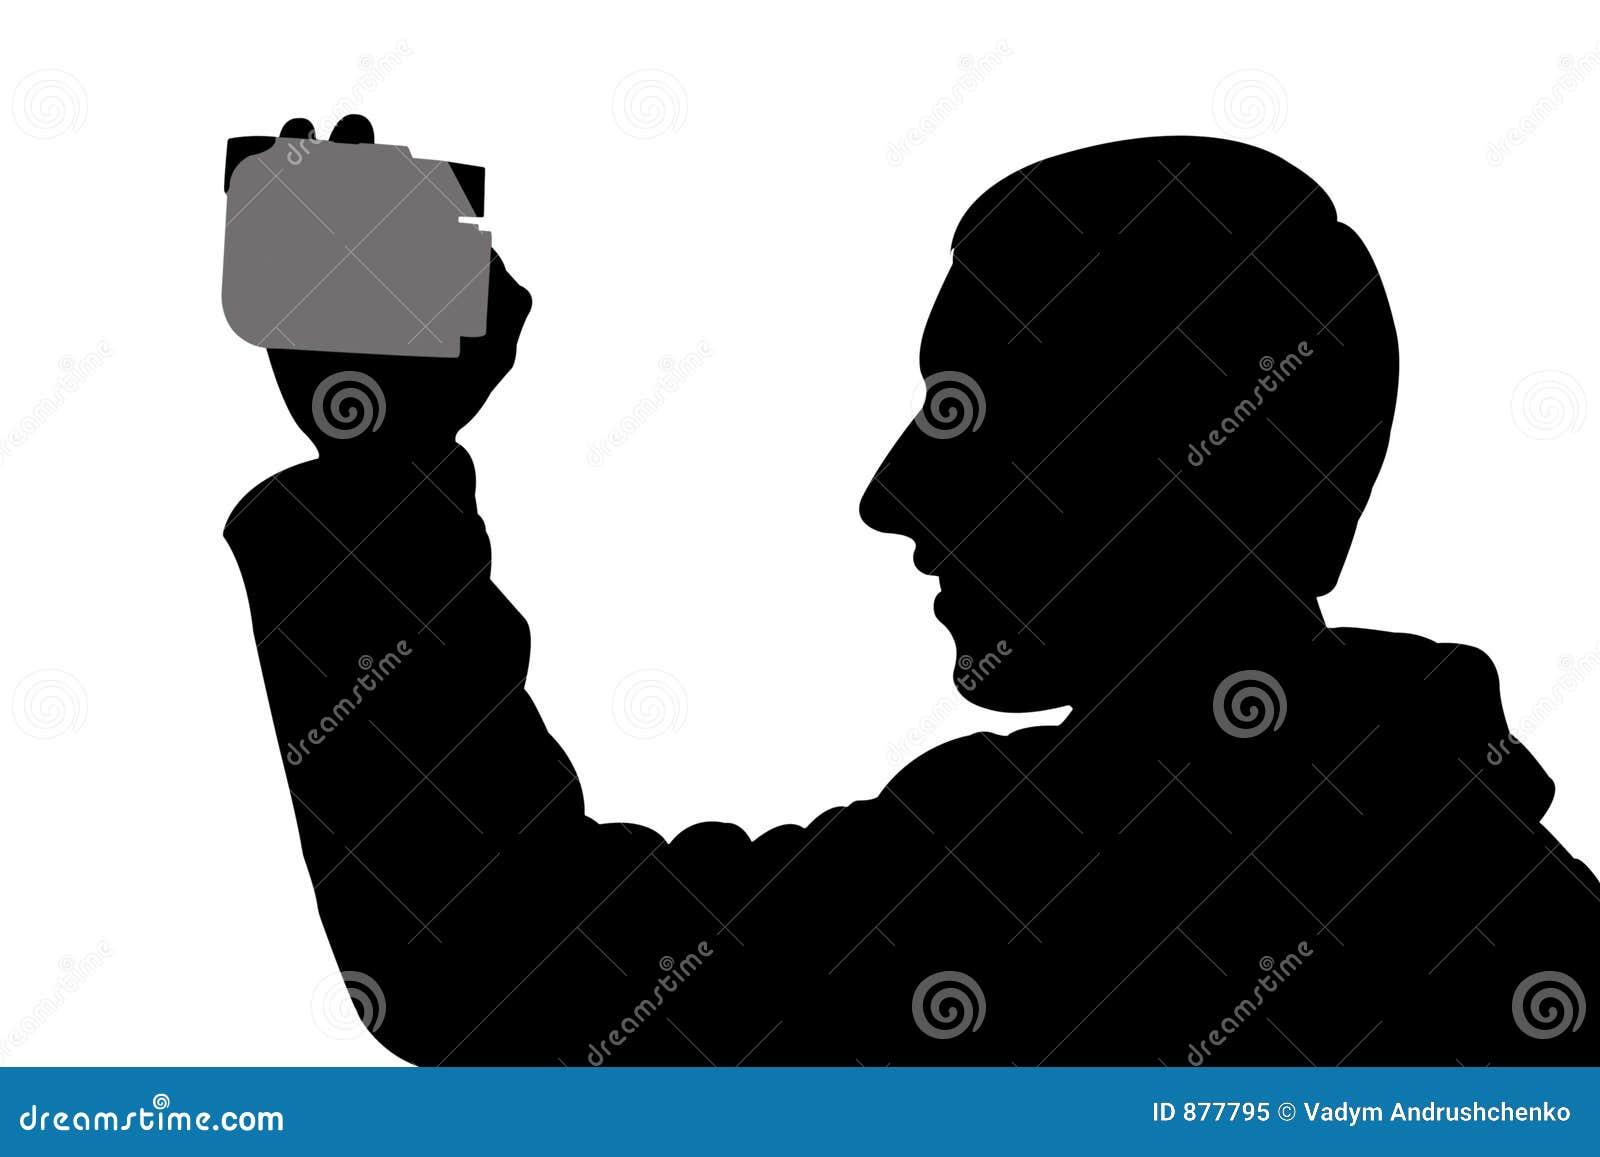 Silhouette man with digicam